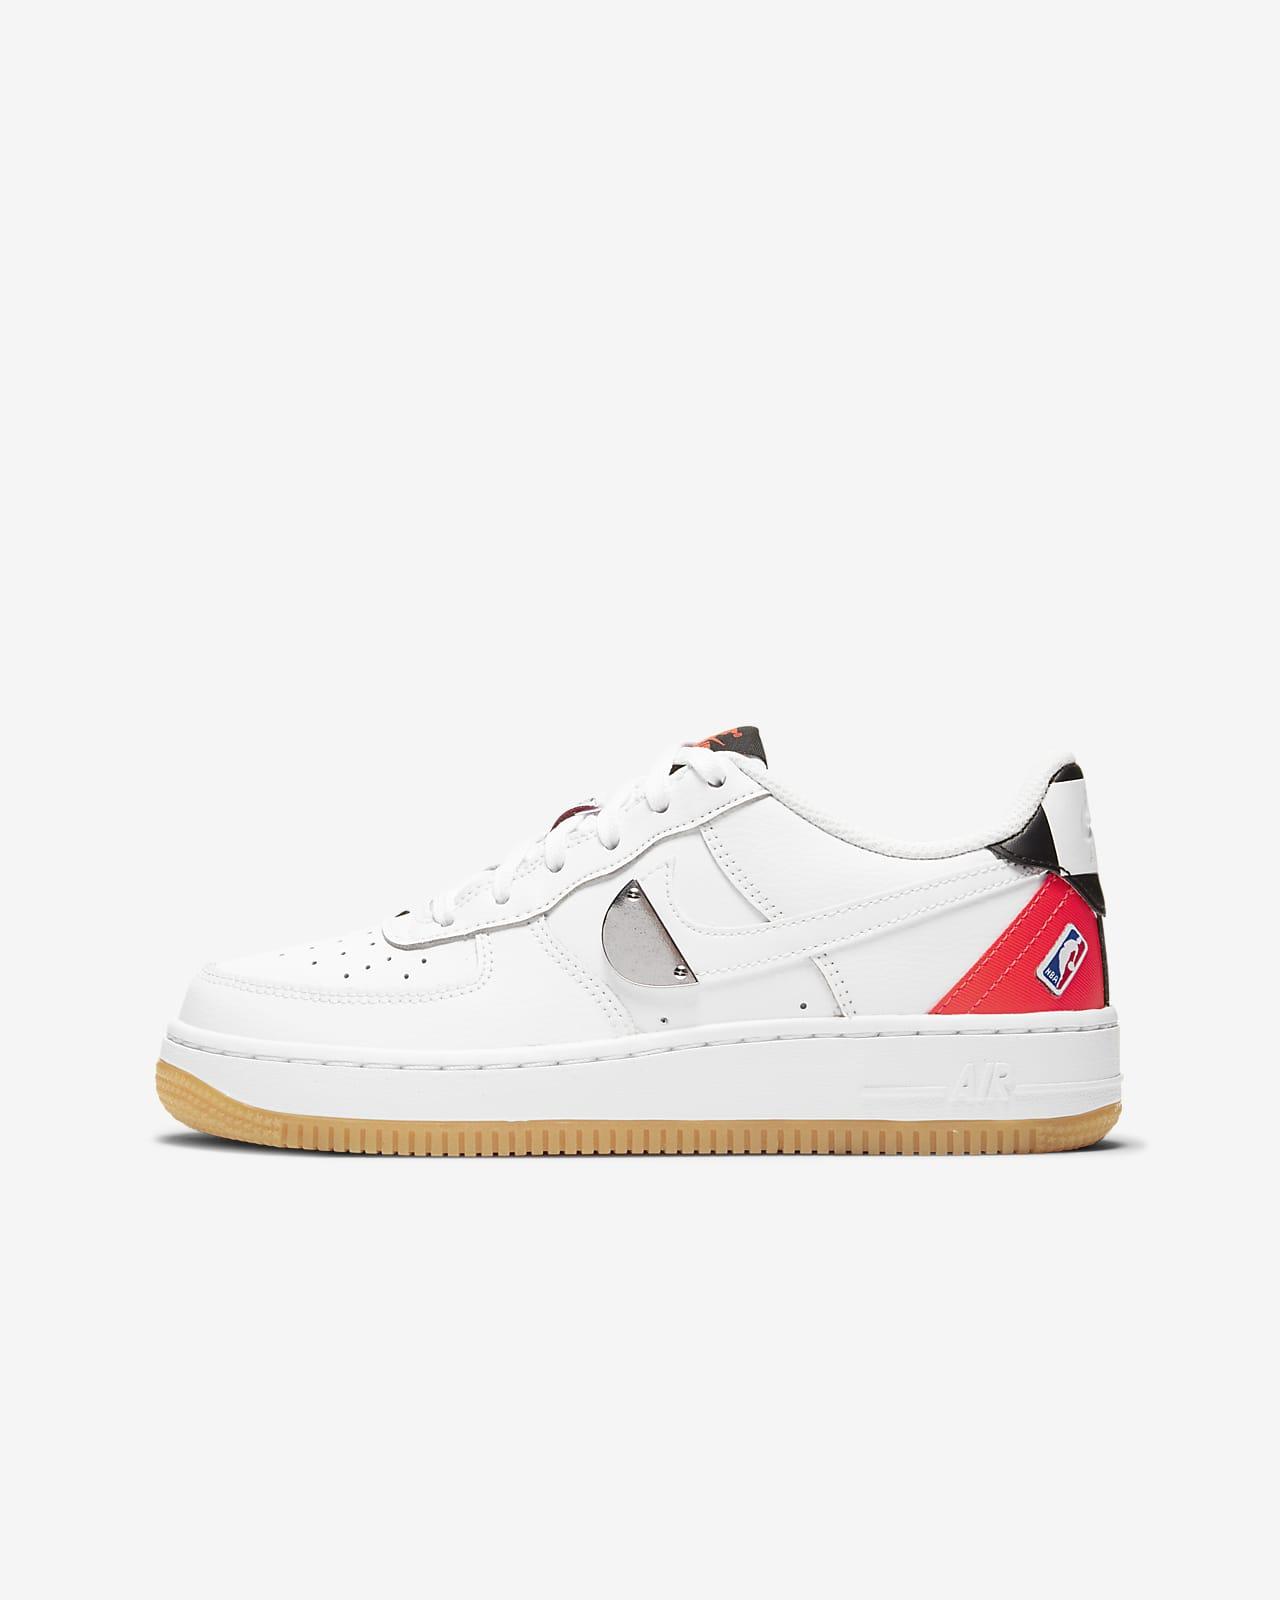 Nike Air Force 1 LV8 1 Kinderschoen